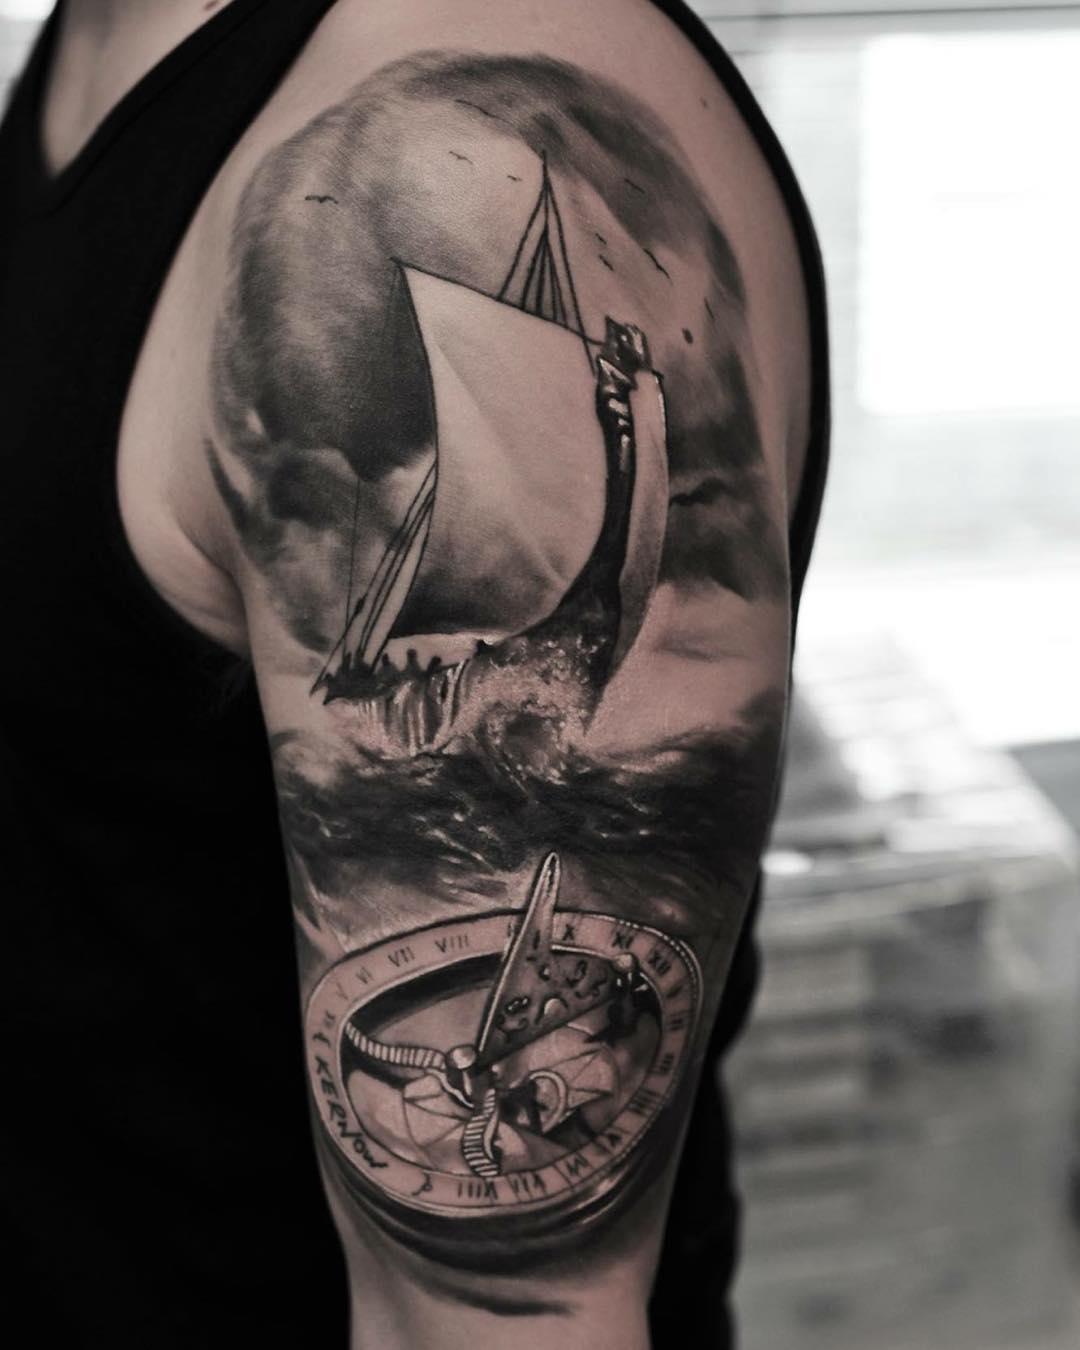 tattoo geek ideas for best tattoos arm tattoos. Black Bedroom Furniture Sets. Home Design Ideas